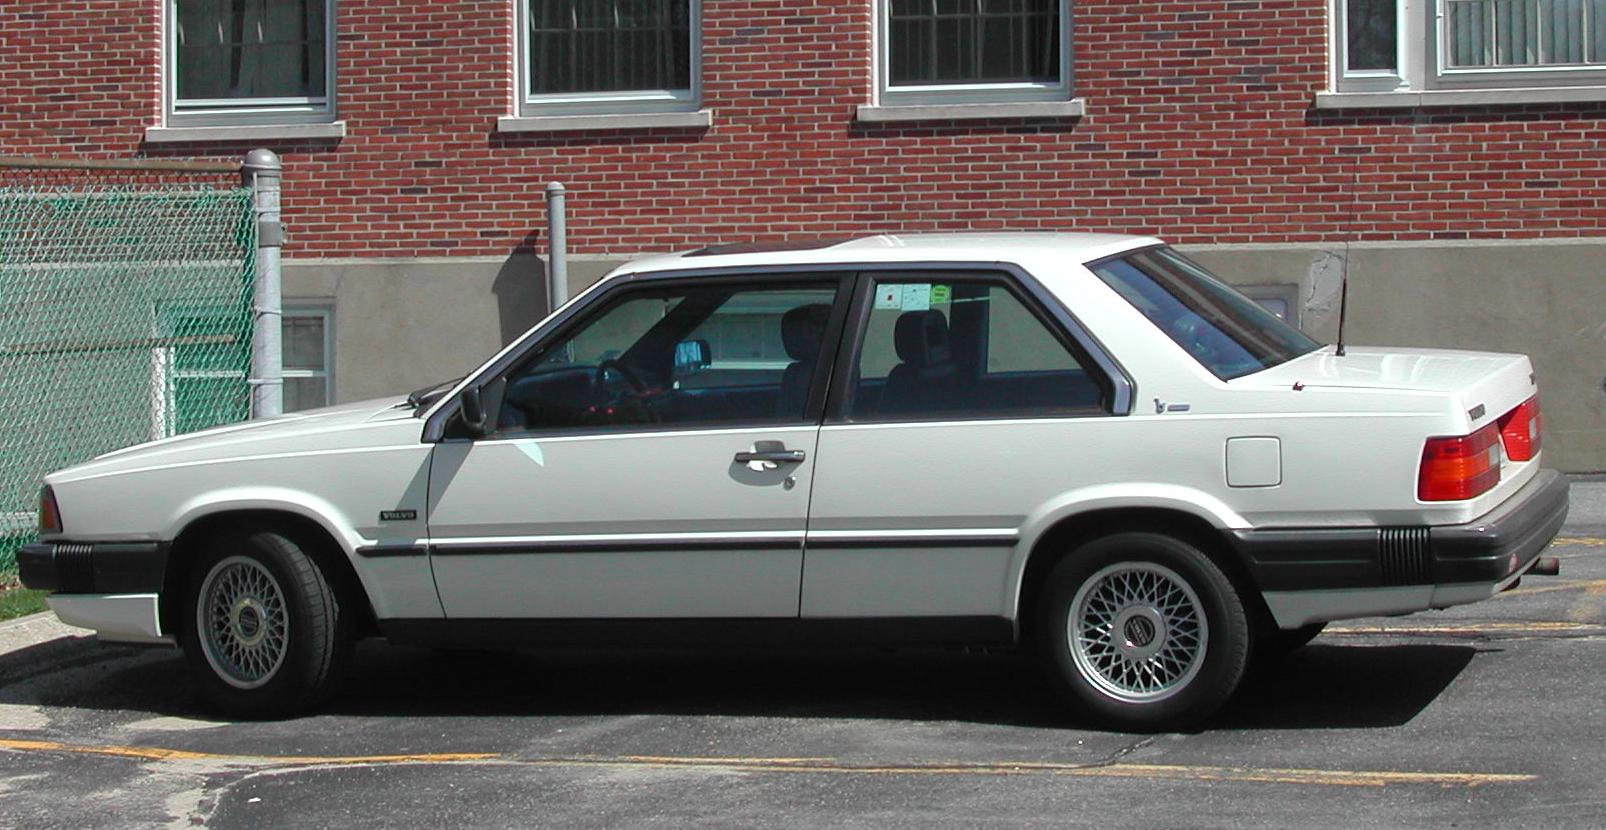 File:Volvo 780 Bertone rear side.jpg - Wikipedia